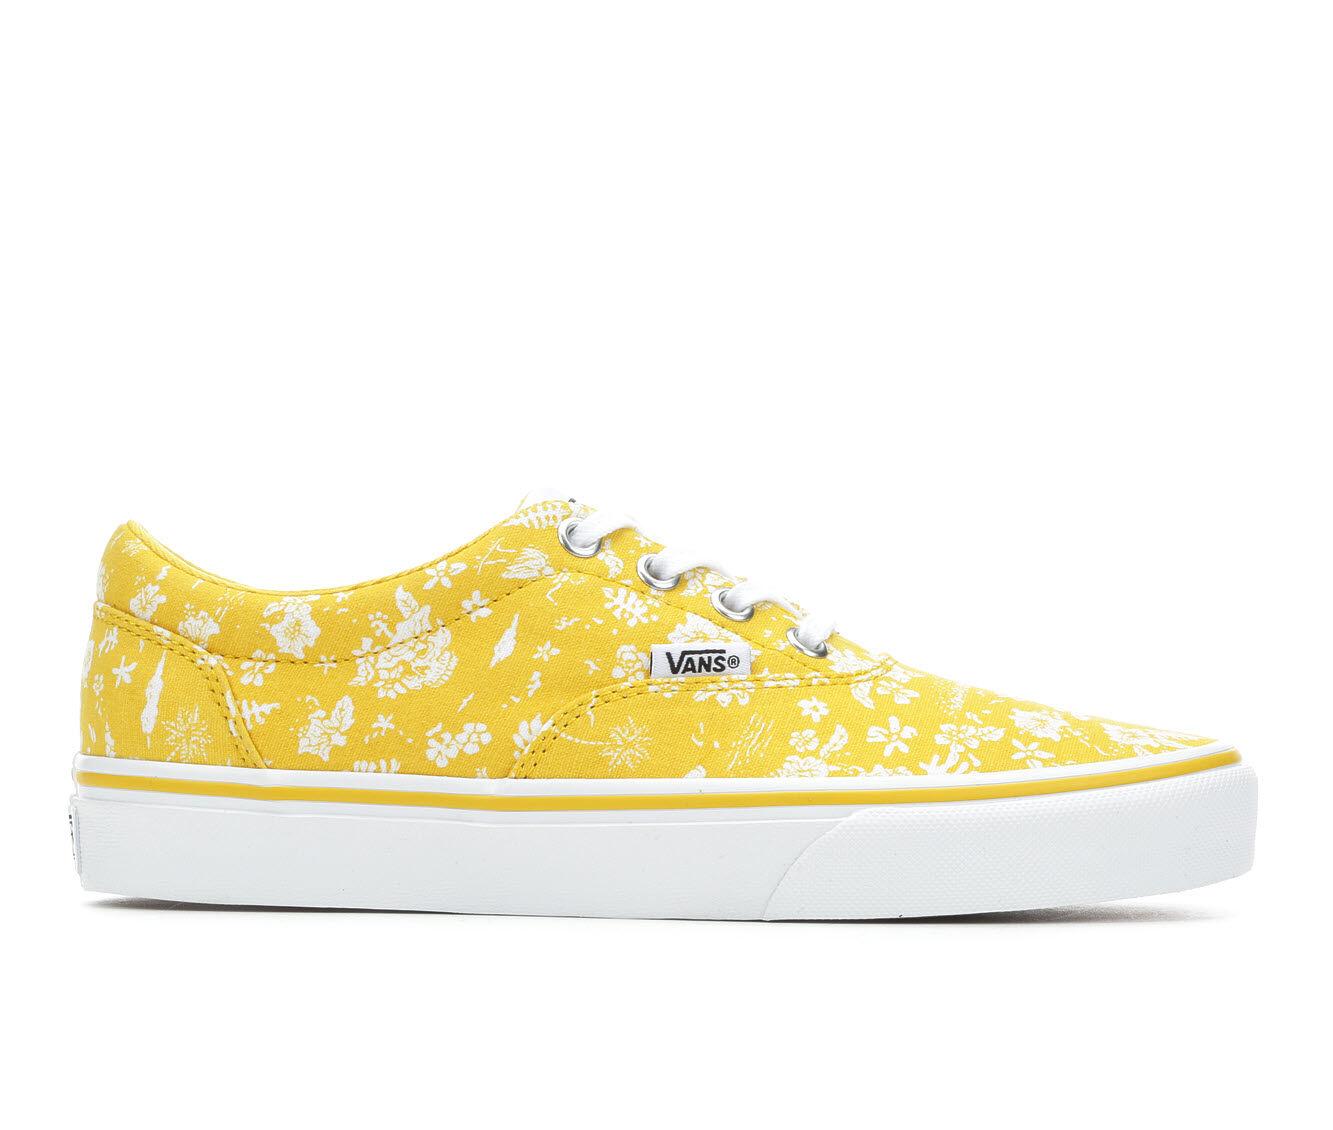 Women's Vans Doheny Skate Shoes | Shoe